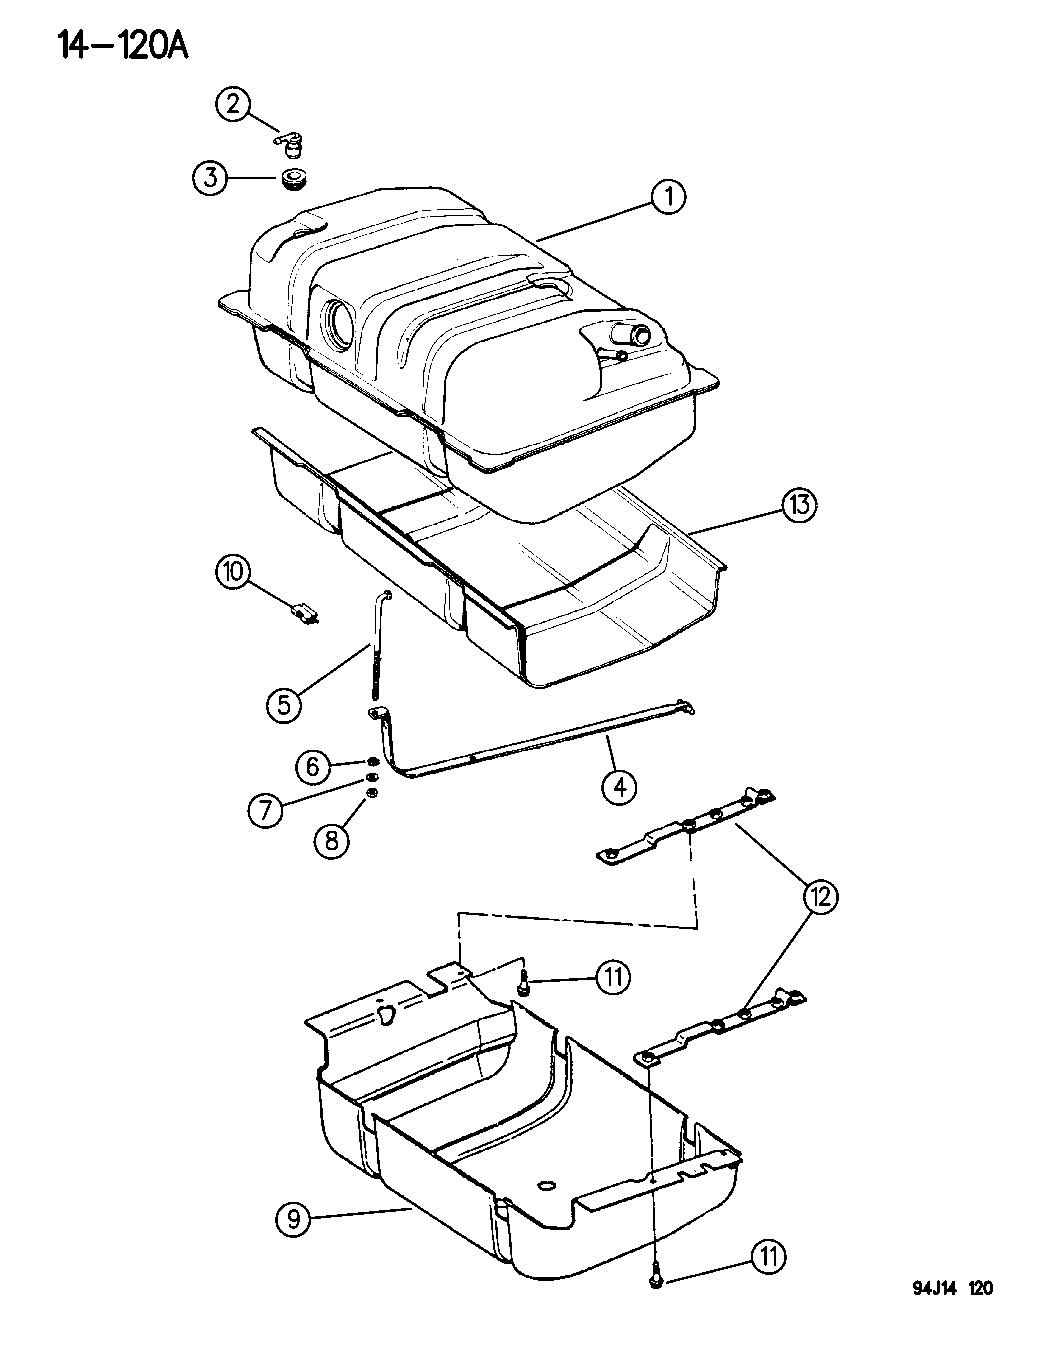 Jeep Cherokee Fuel Tank